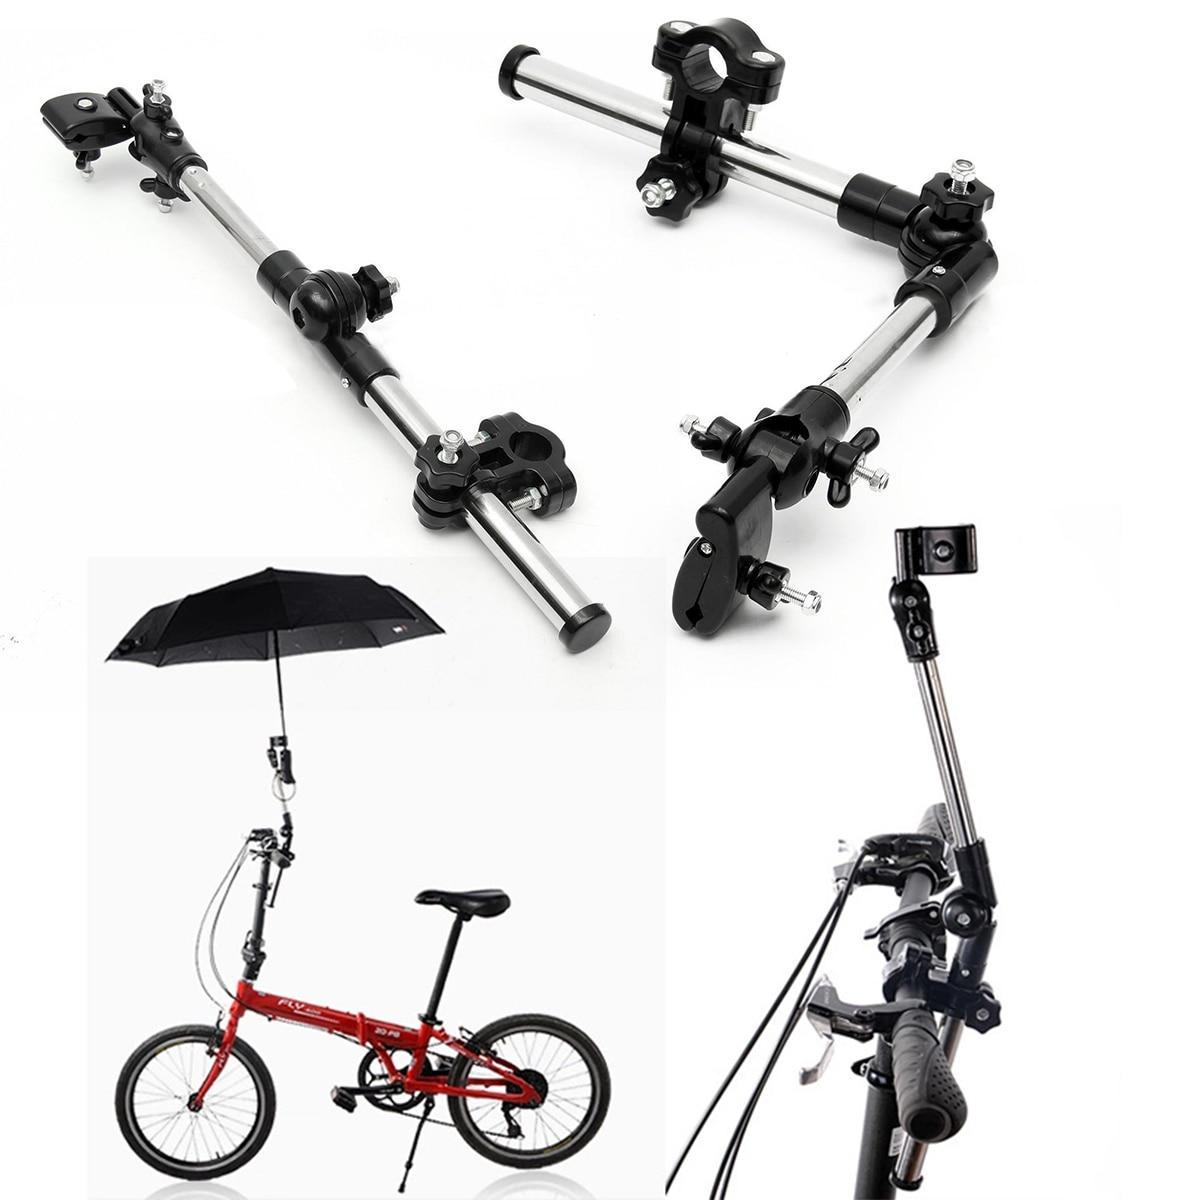 1pcs New Bike Umbrella Holder Universal Bicycle Umbrella Holder Stand Child Baby Cart Wheelchair